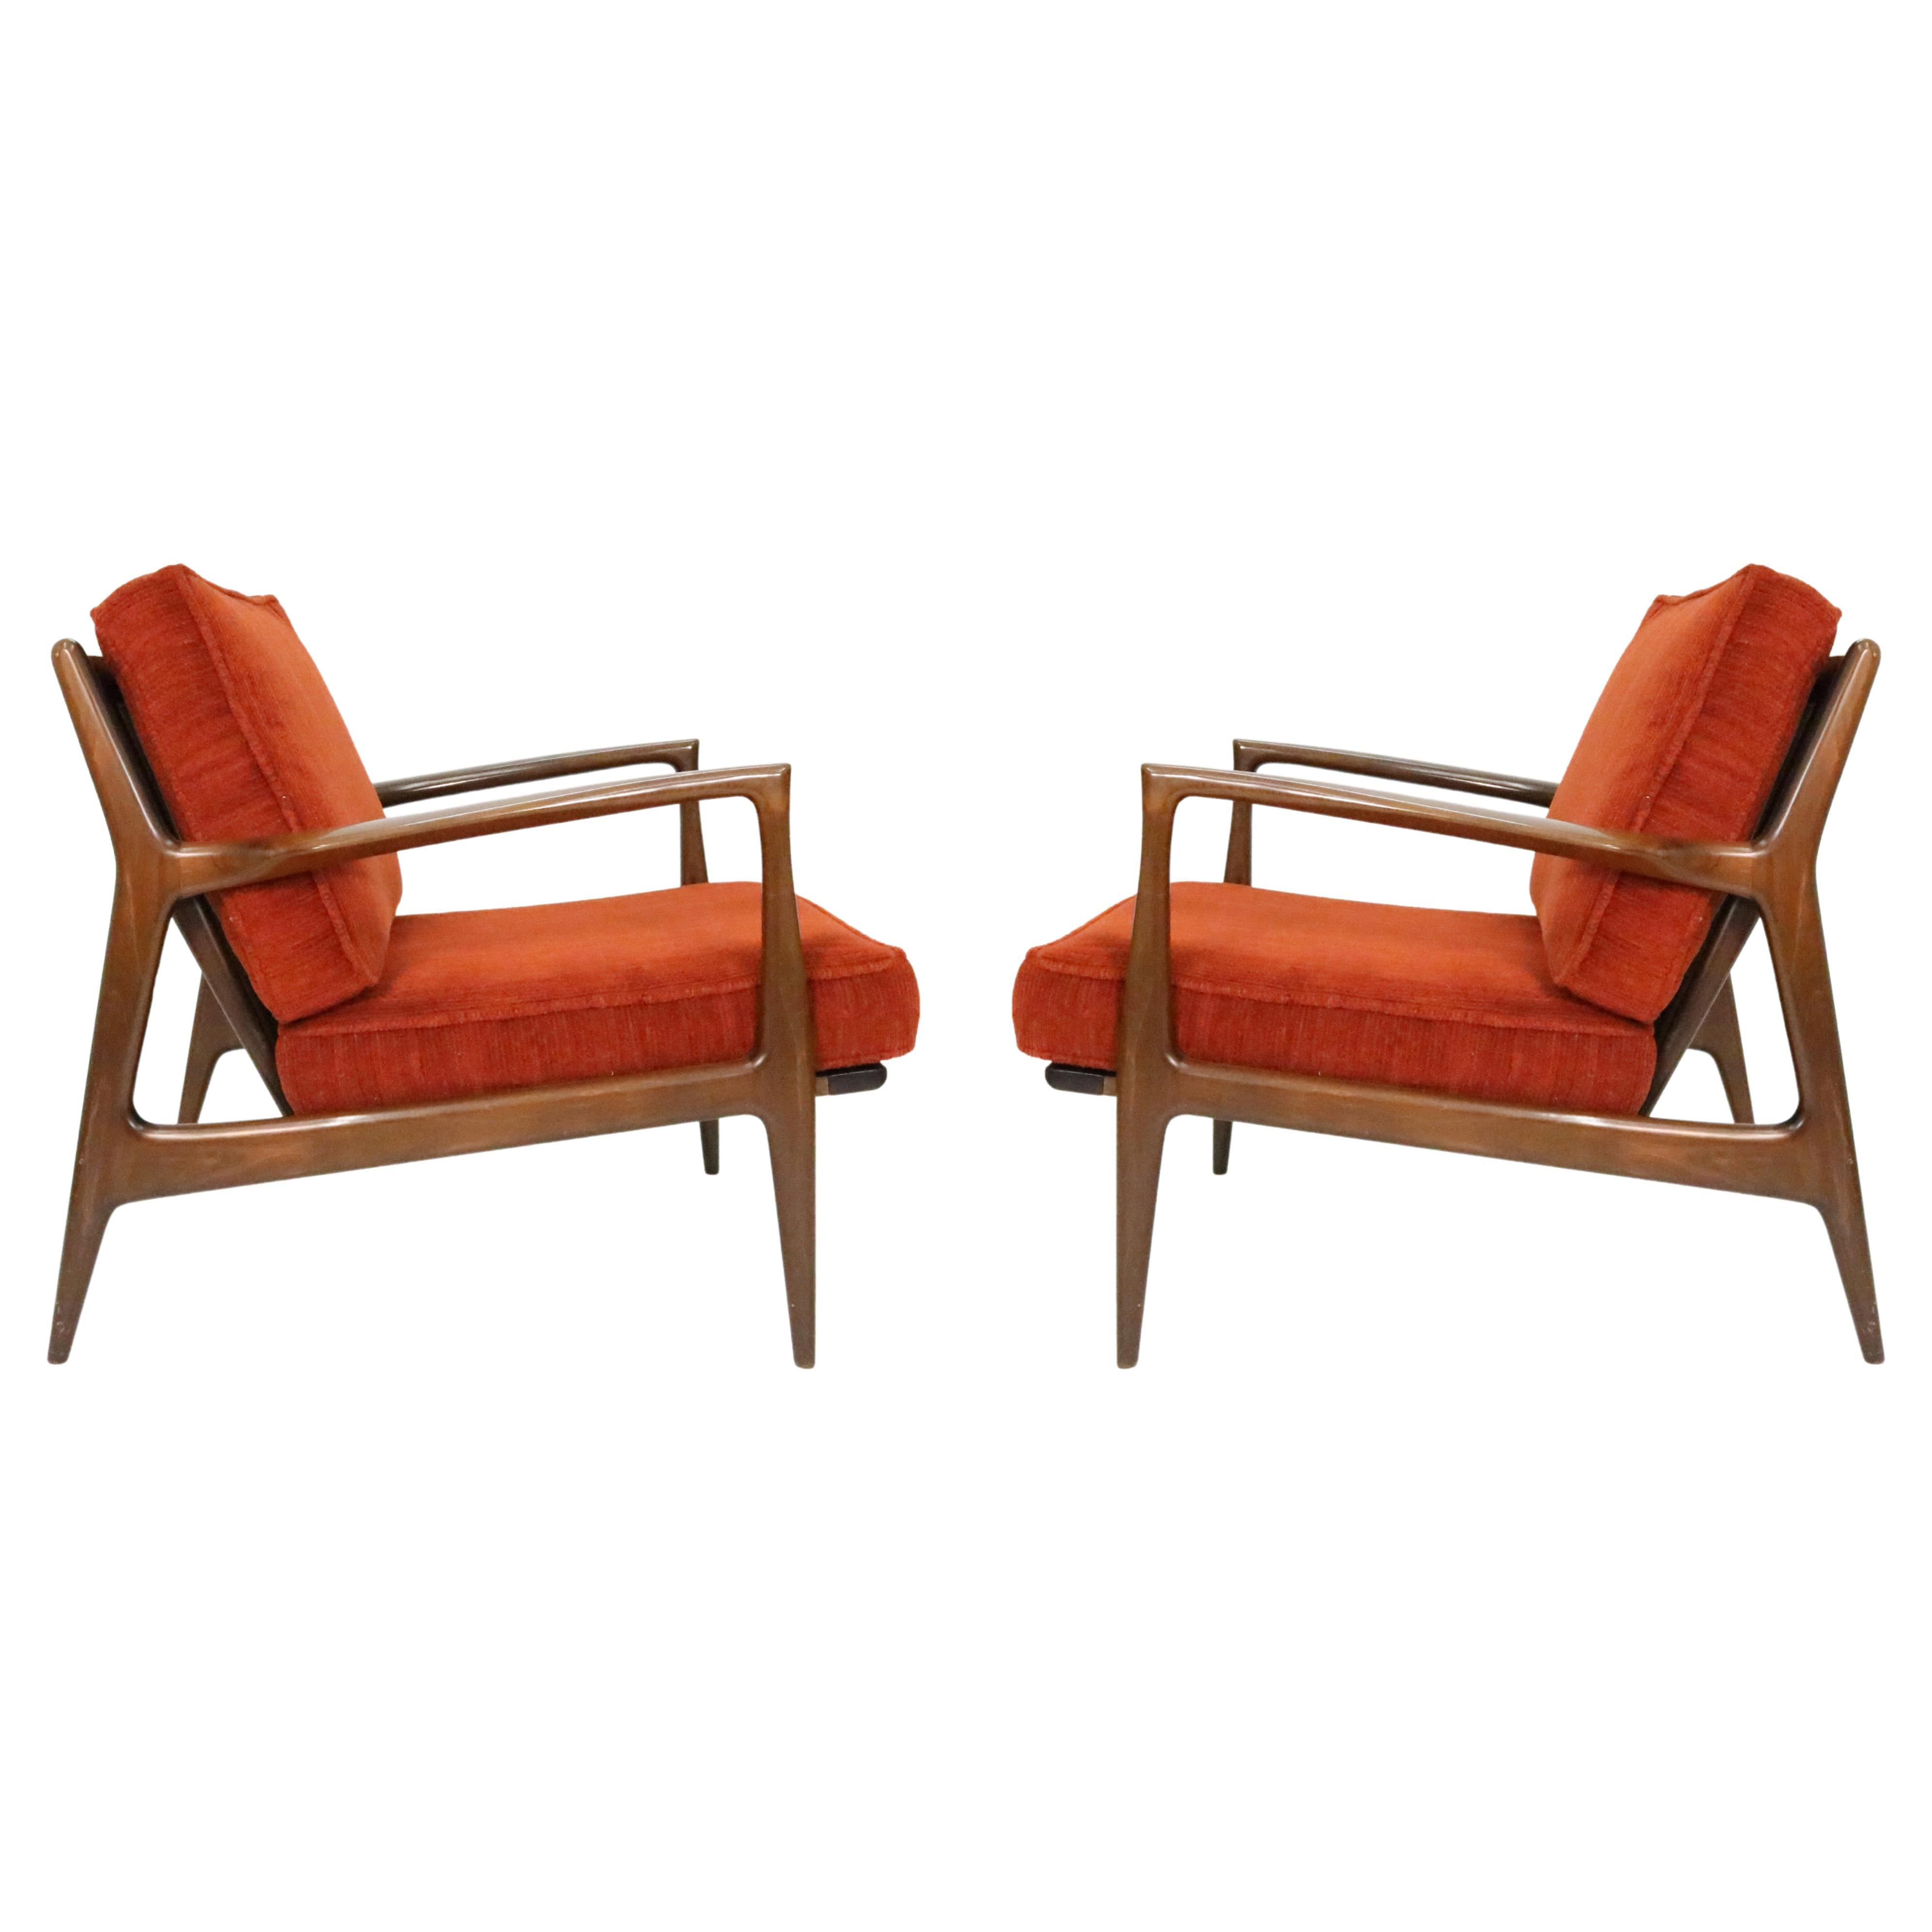 Kofod-Larsen Danish Modern Sculpted Lounge Chairs for Selig